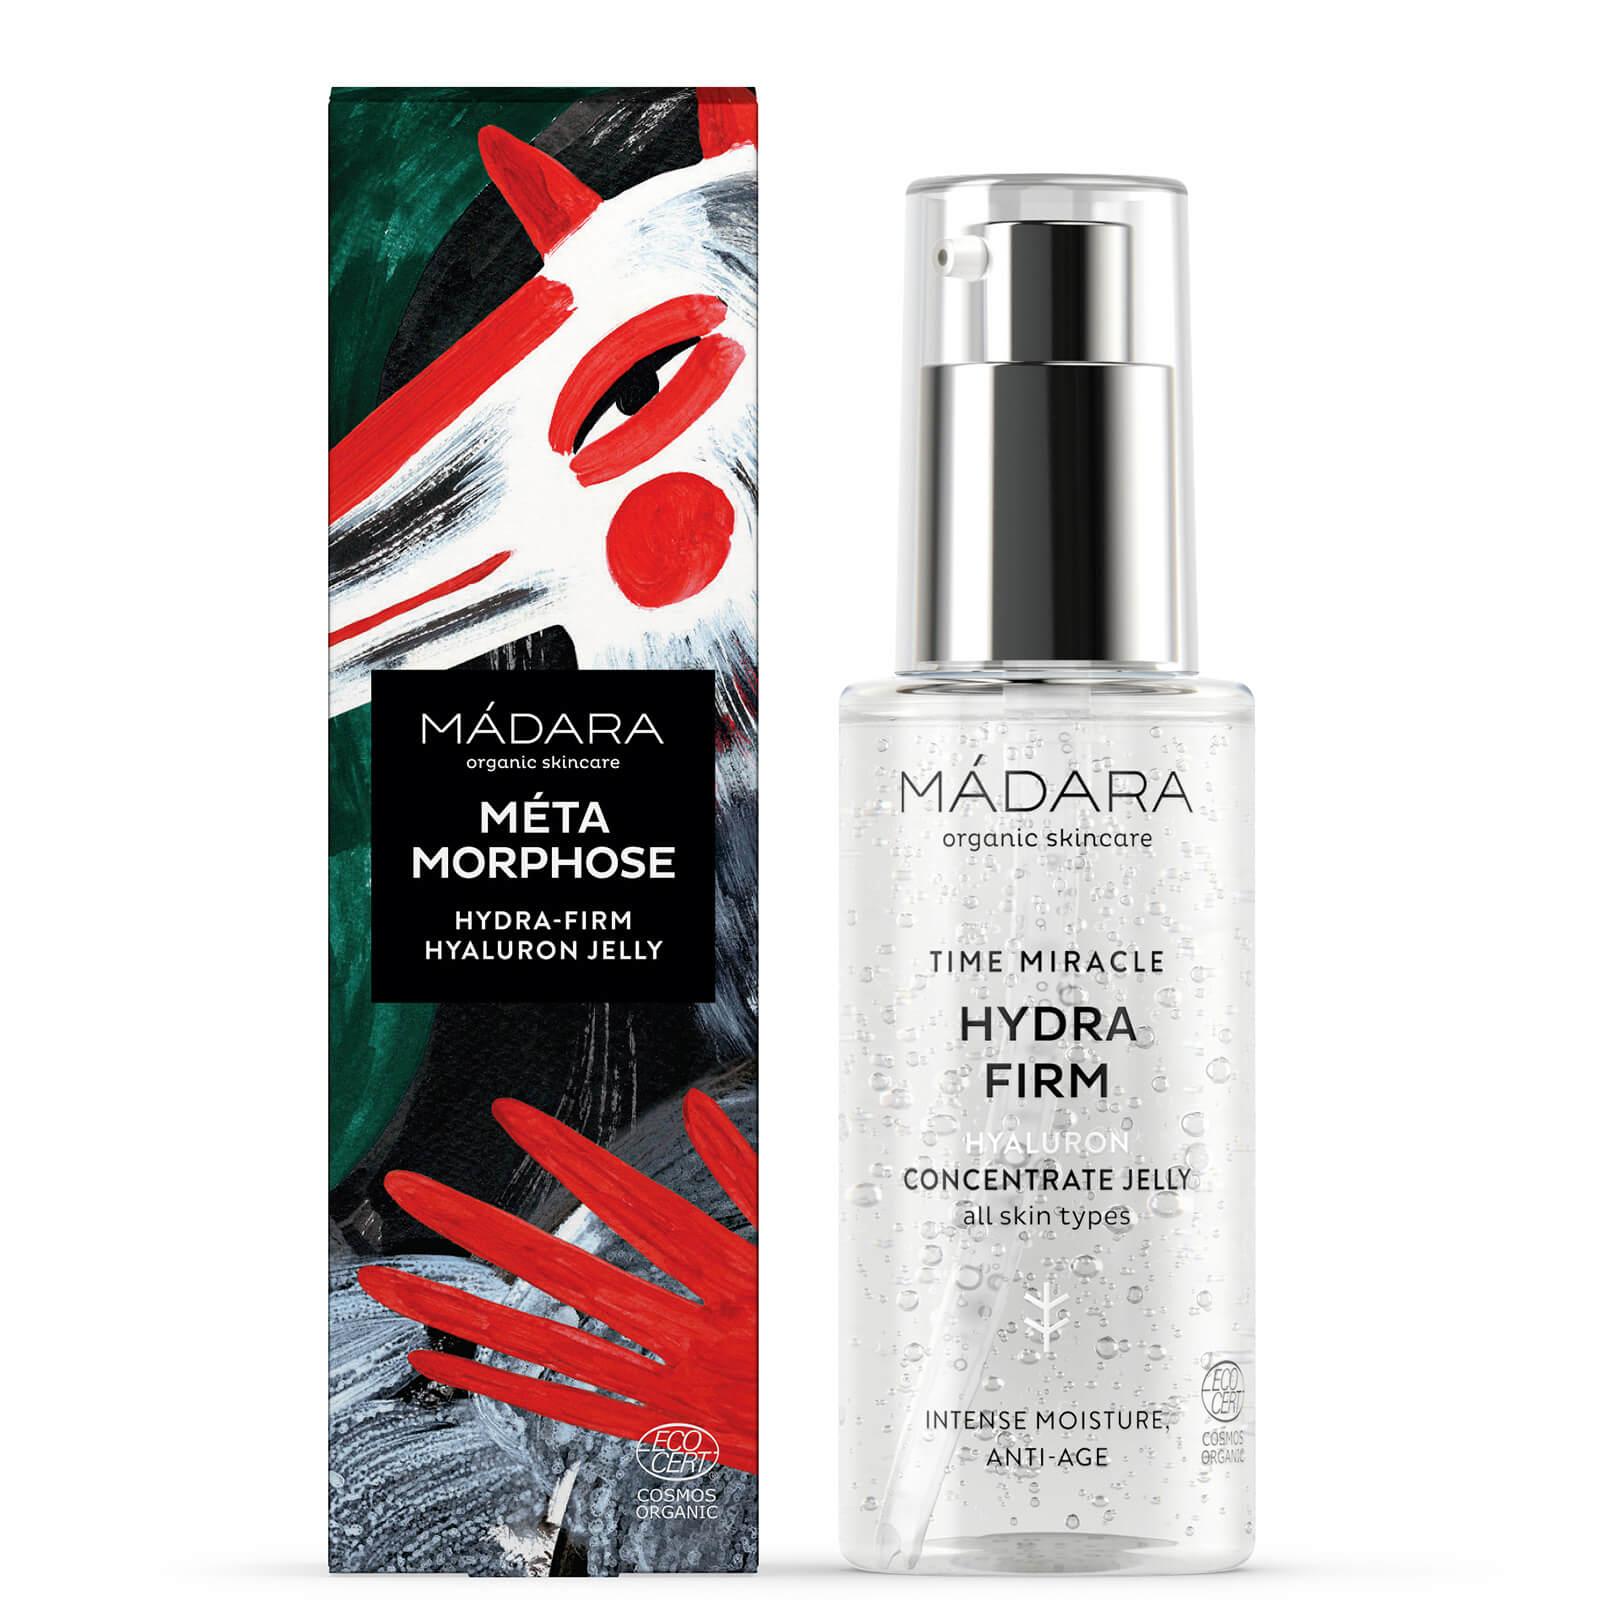 MÁDARA Métamorphose Hydra Firm Hyaluron Concentrate Jelly 75ml